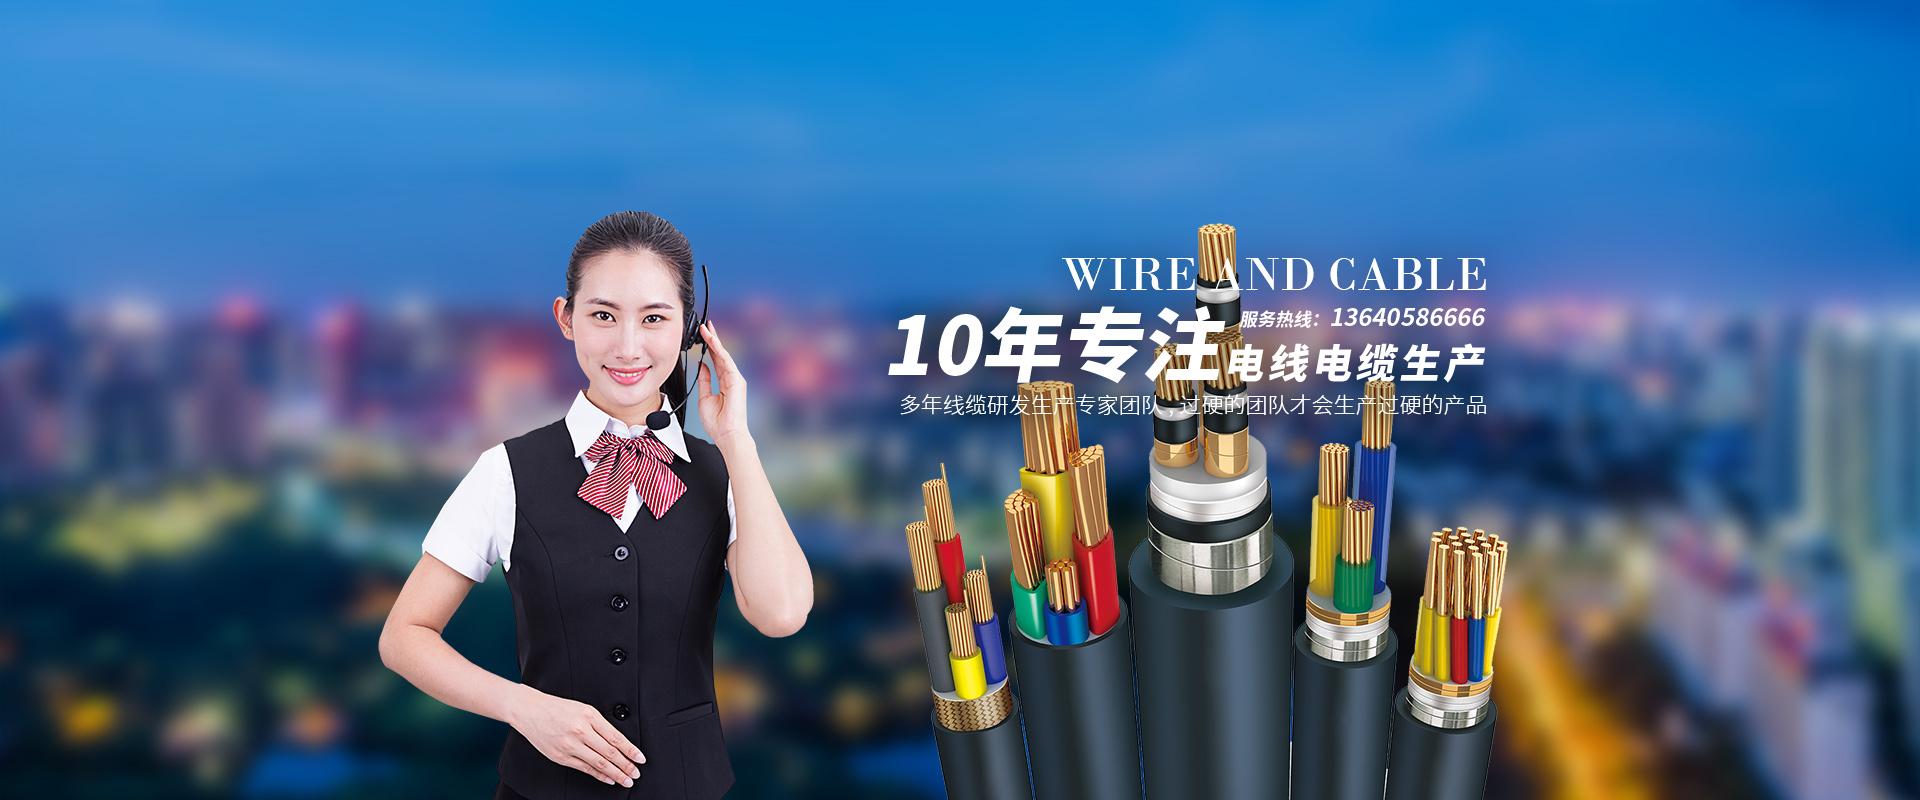 wwwyzc88官网电力ca88亚洲城下载官网